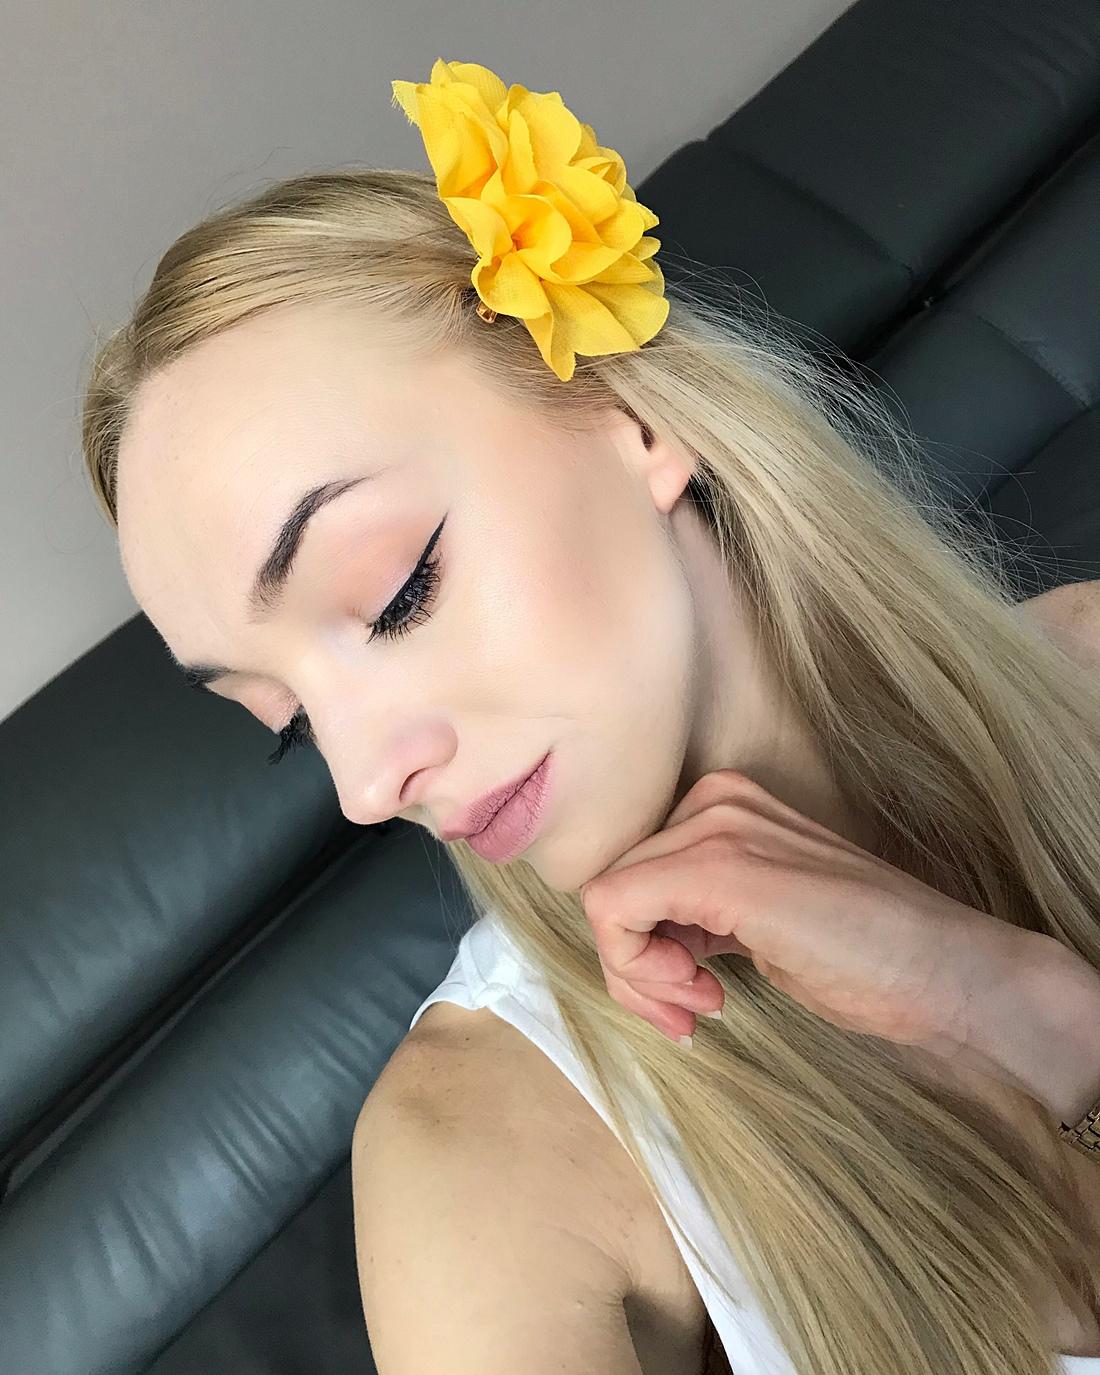 Annabelle Minerals - makijaż mineralny. Wady i zalety! Kate Nate